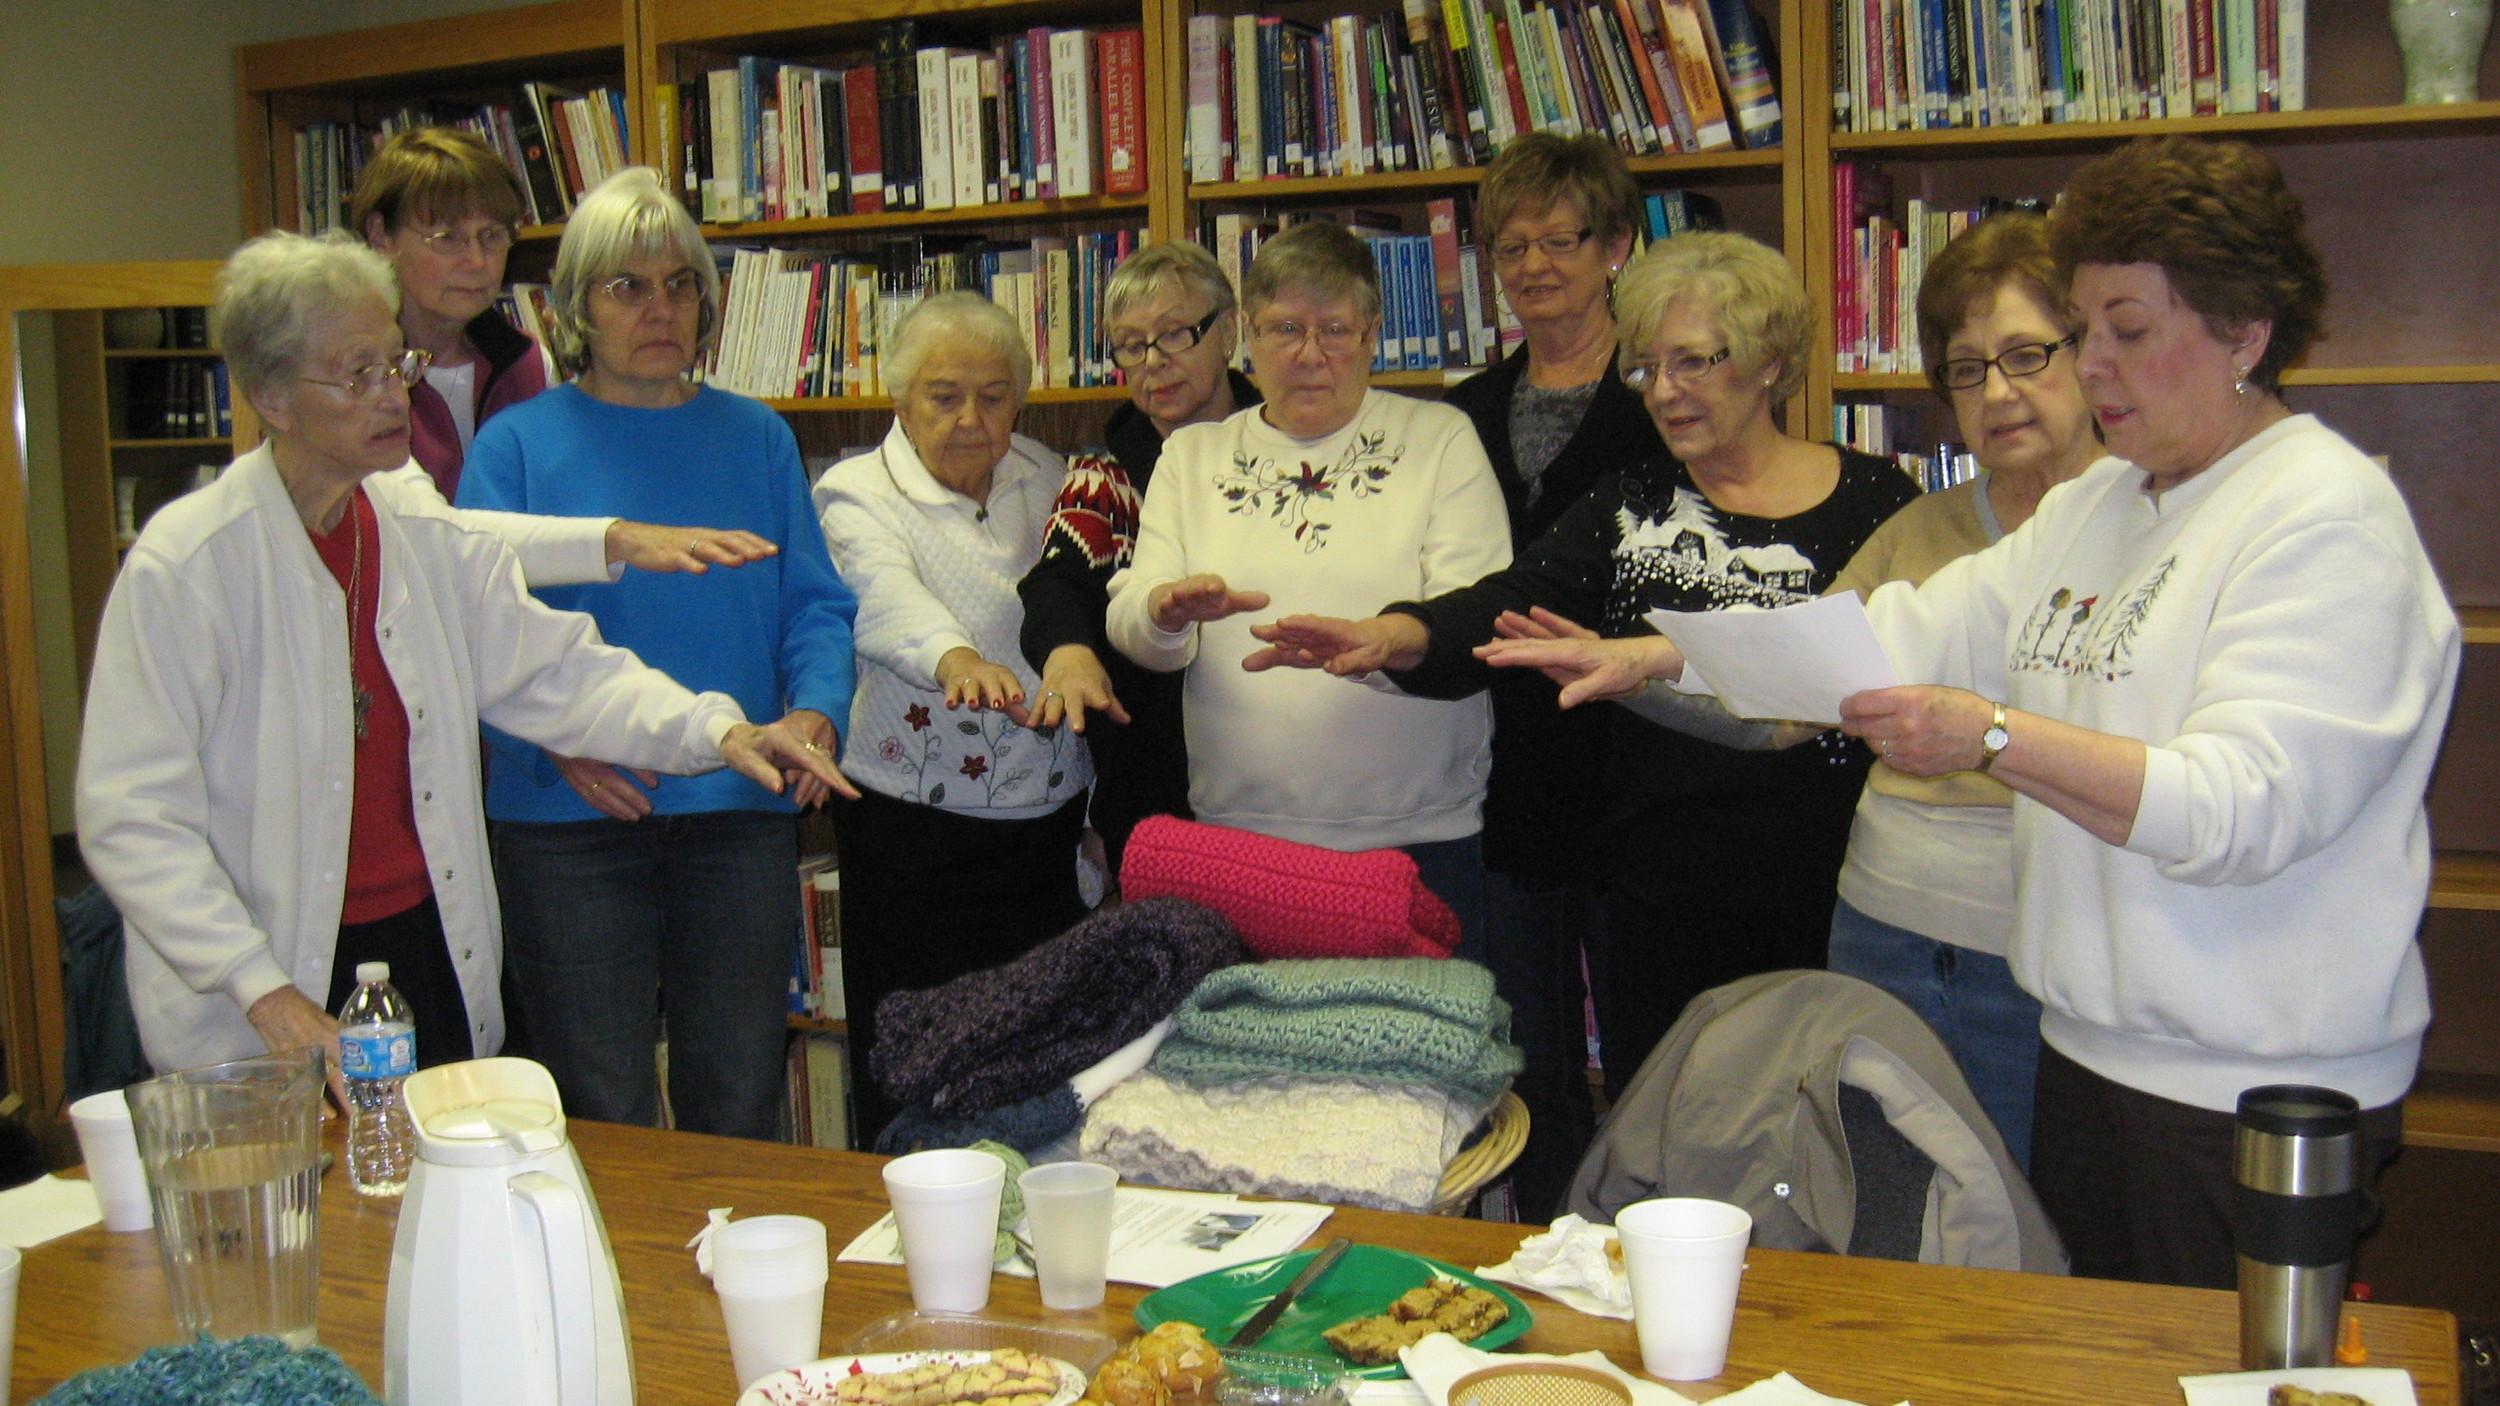 Blessing the Prayer Shawls